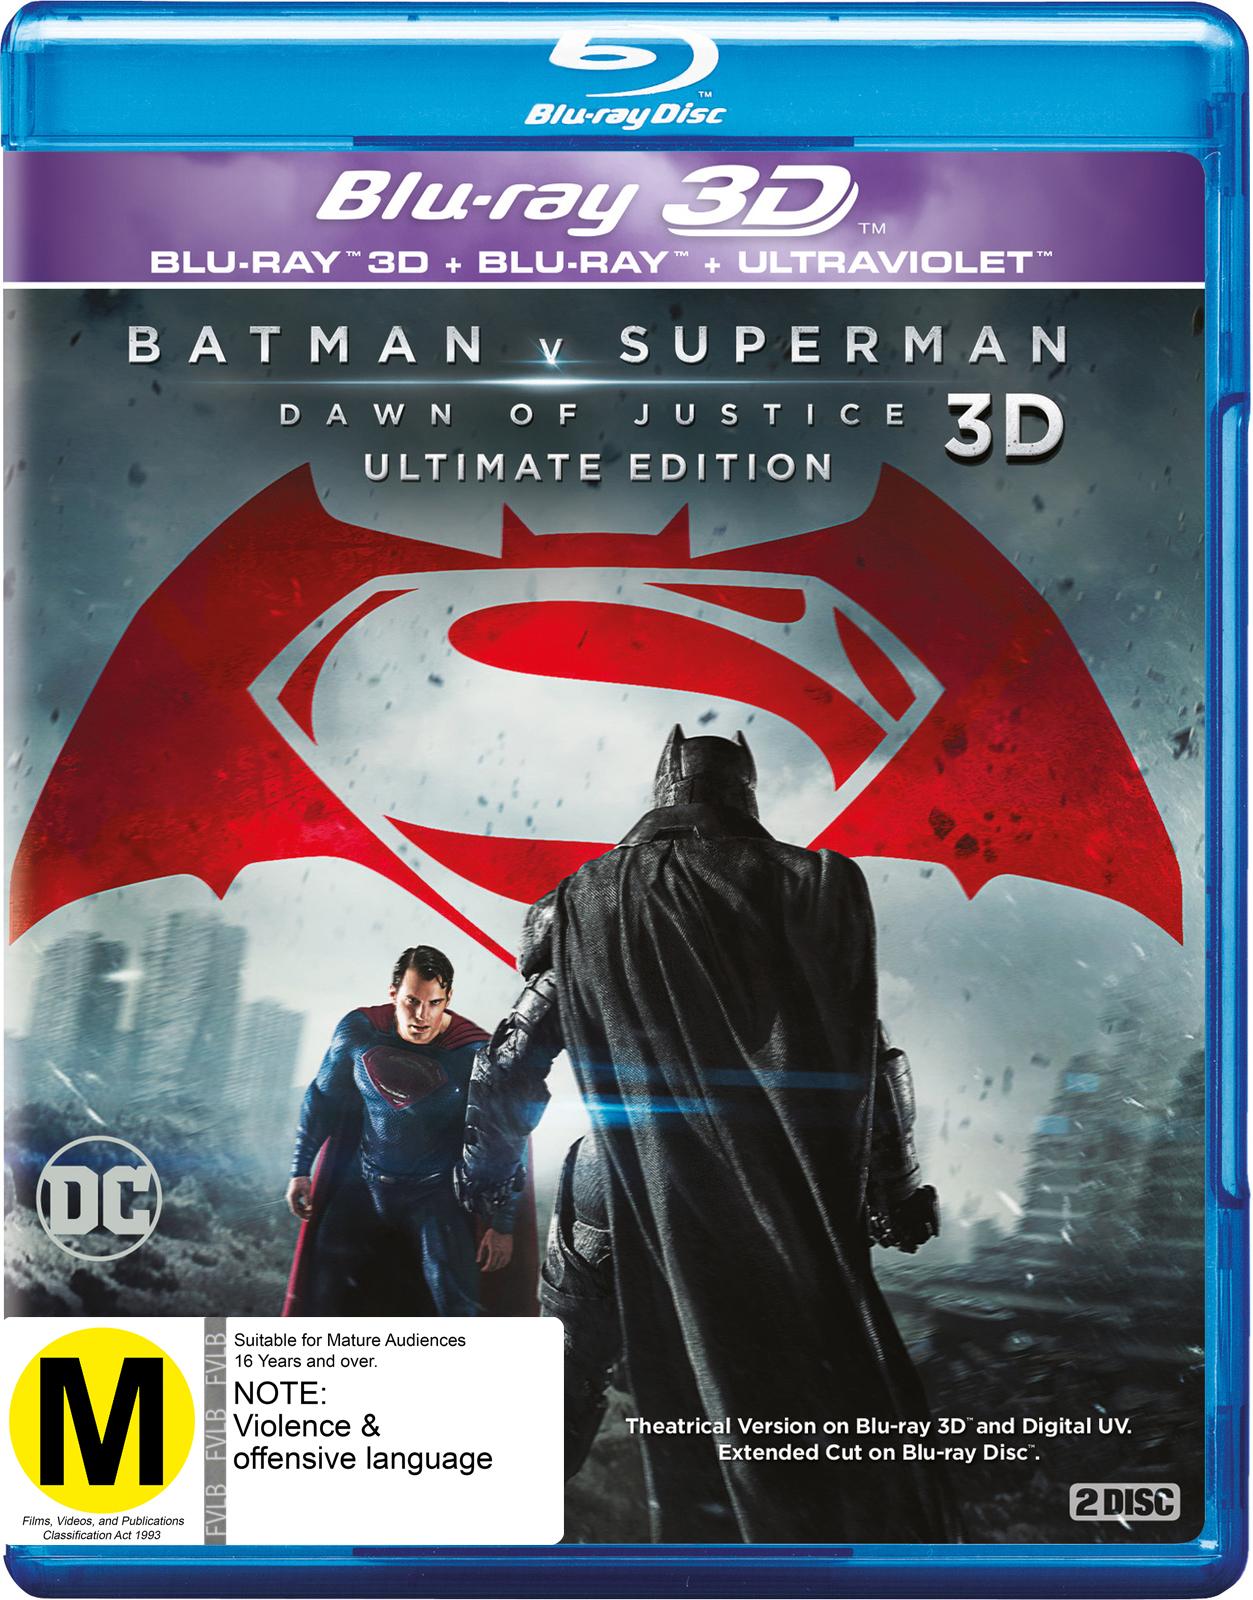 Batman v Superman: Dawn of Justice 3D on Blu-ray, 3D Blu-ray image